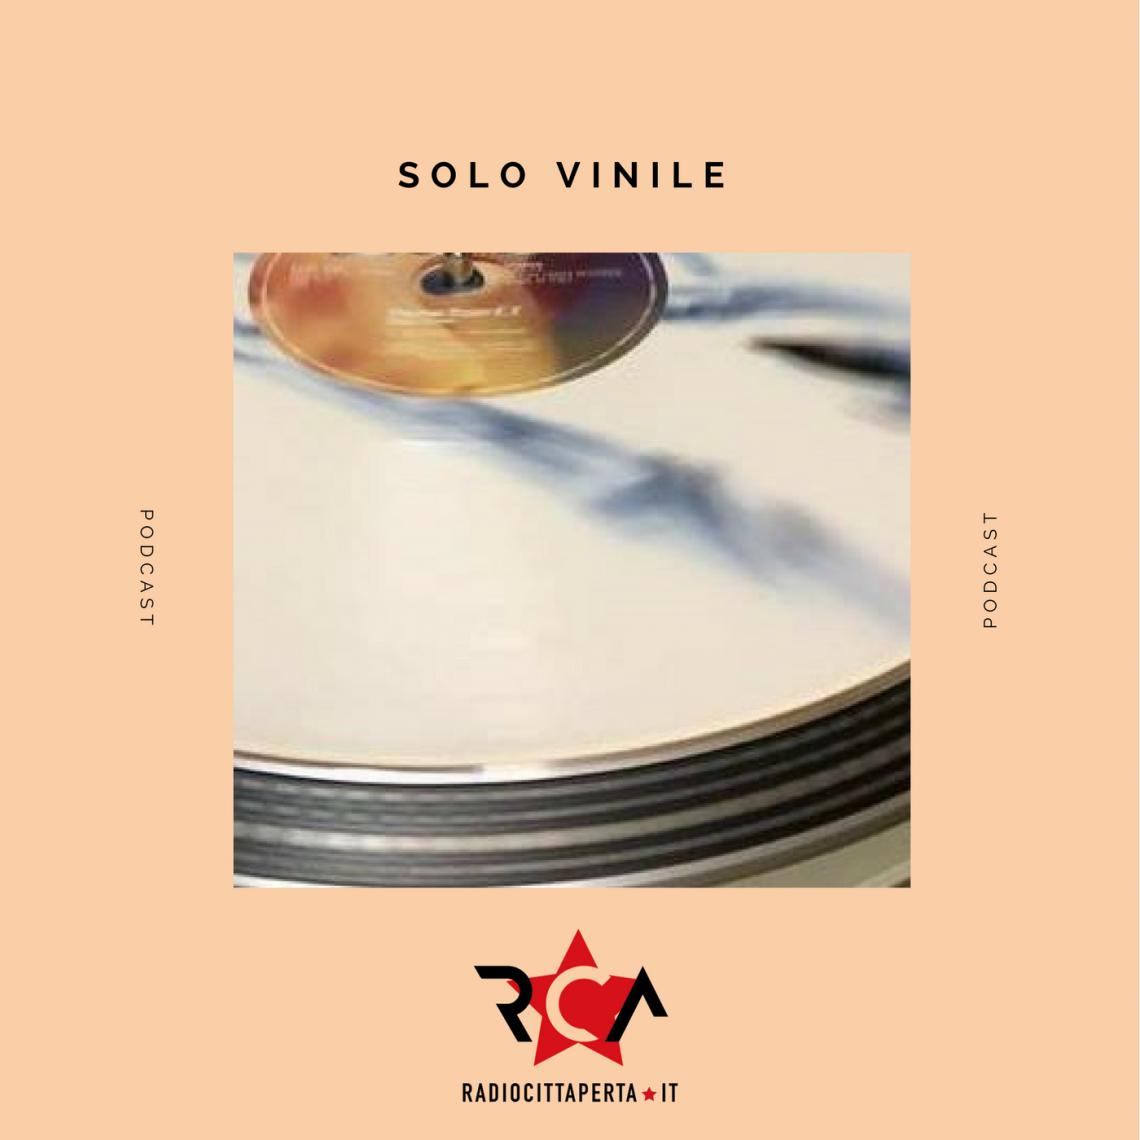 solo vinile – ita 2 merged